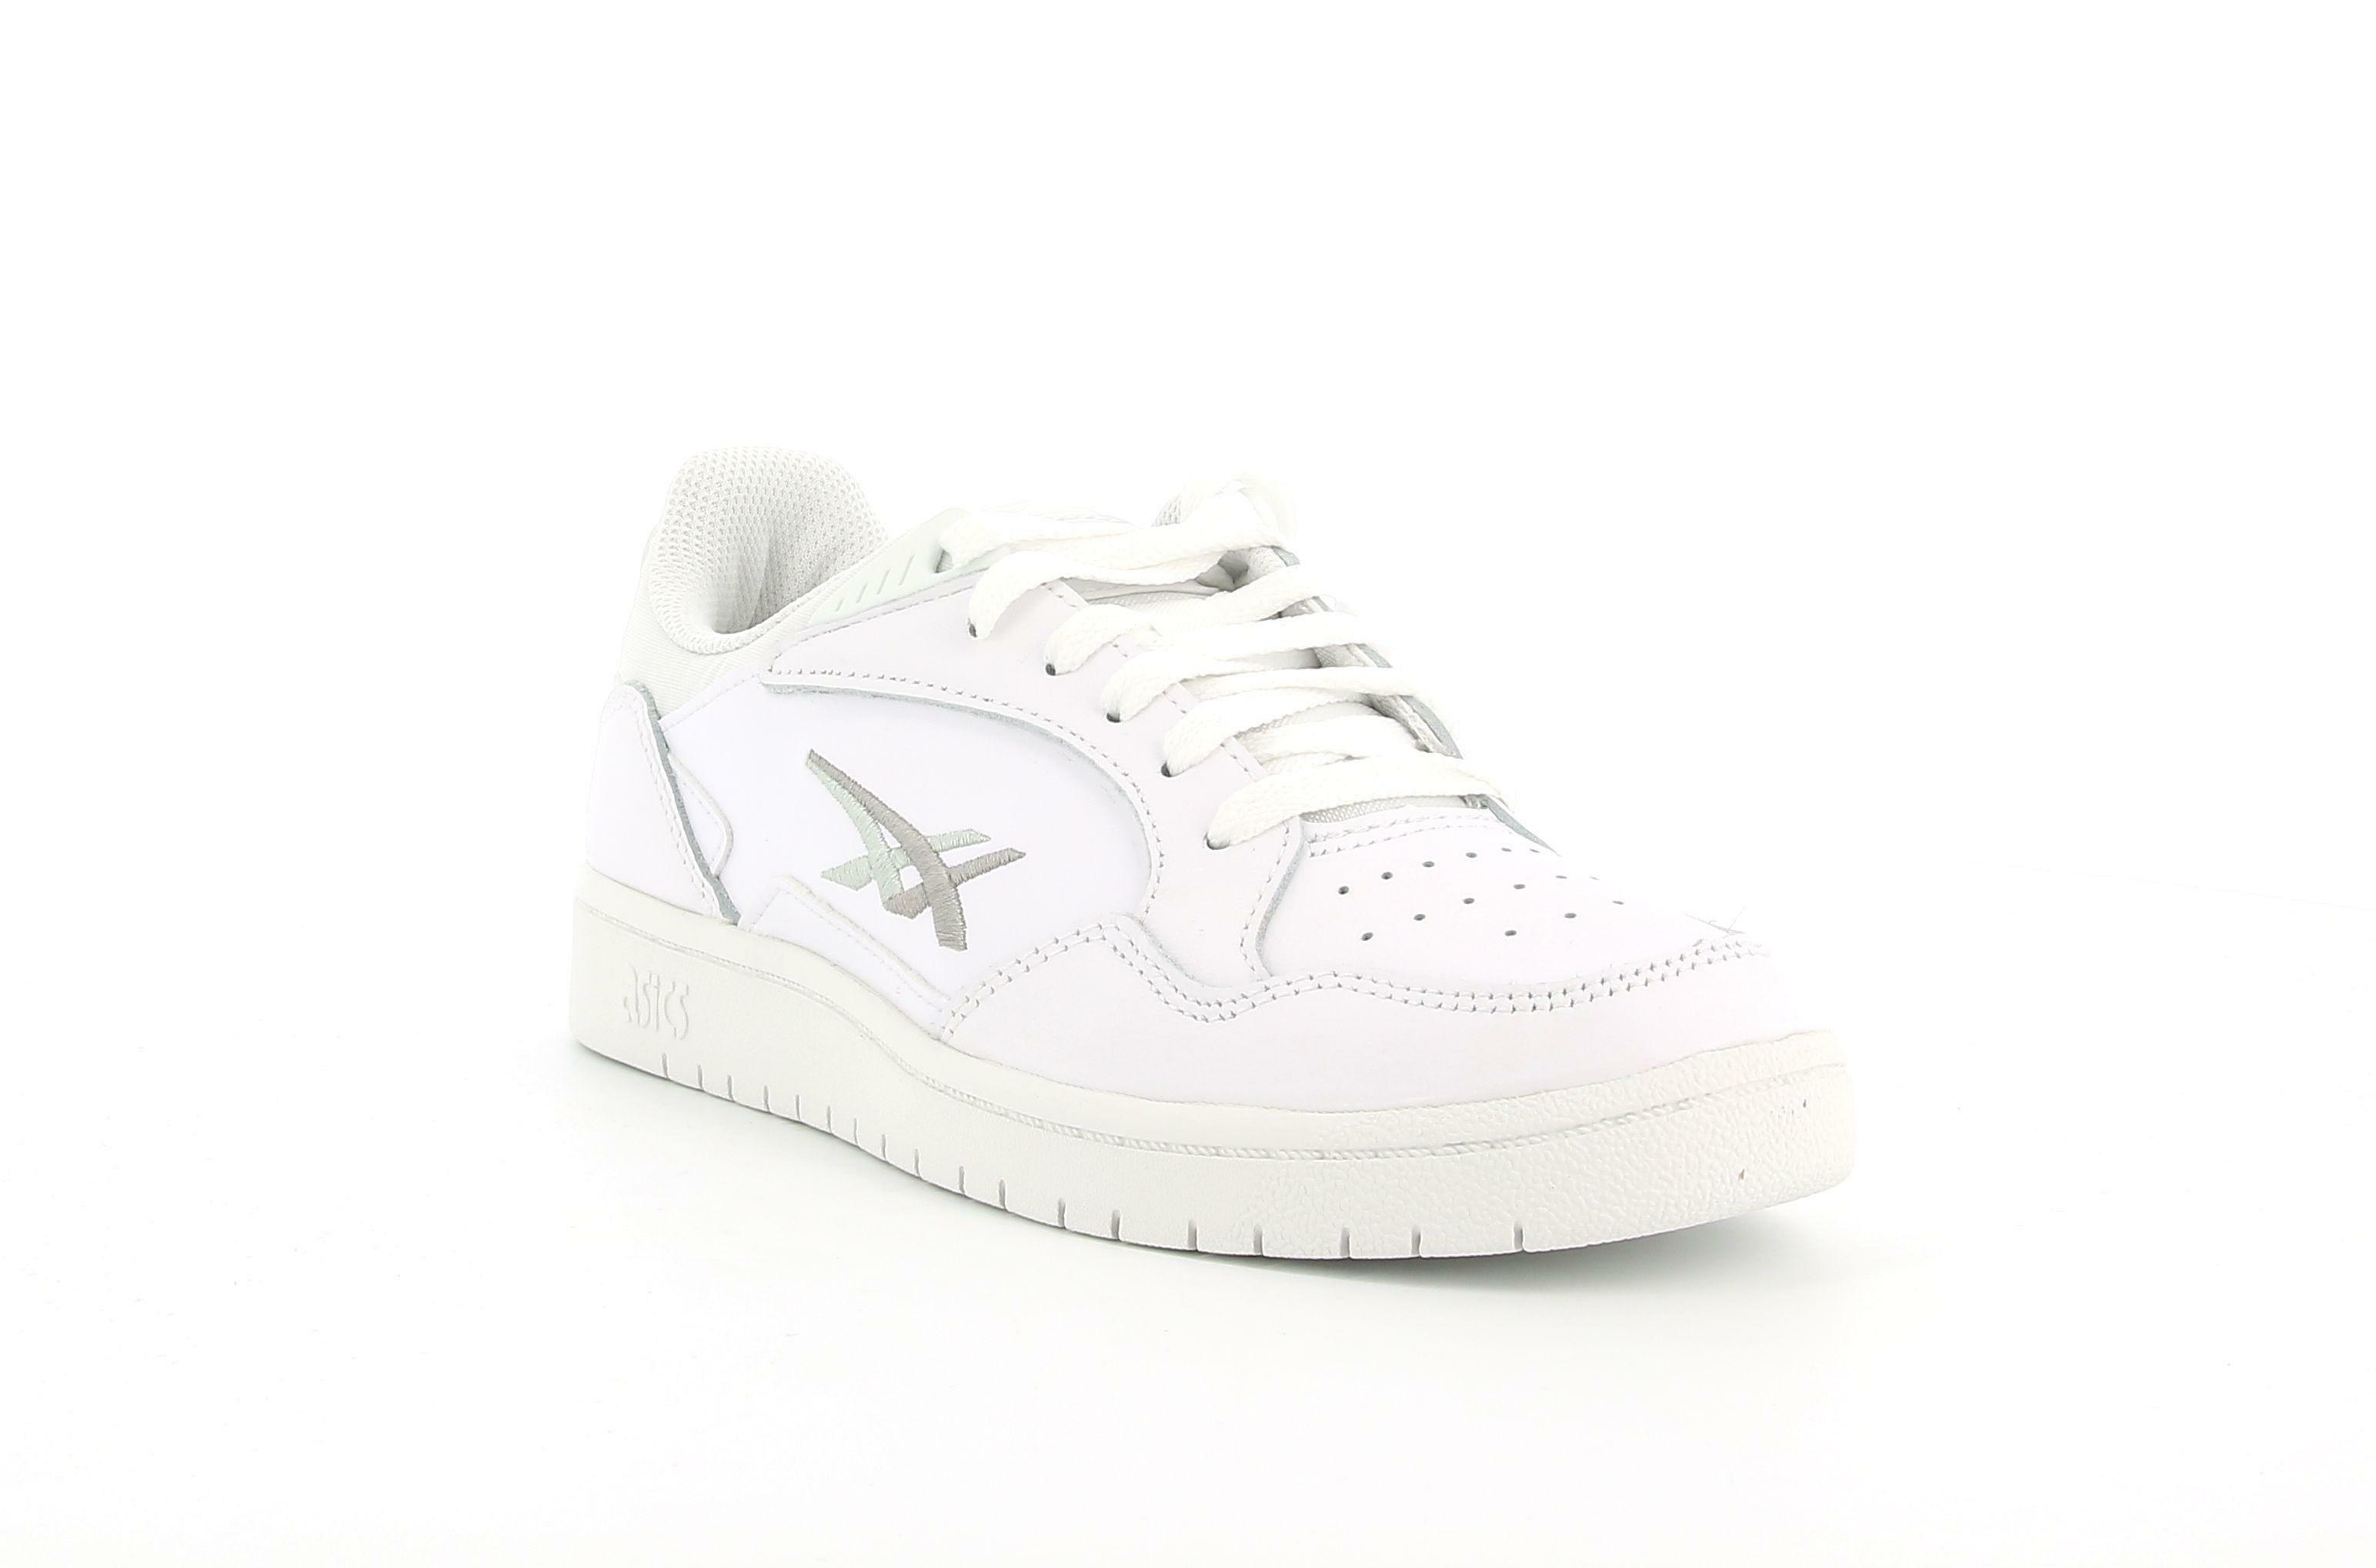 asics asics skycourt 1202a066 scarpa sportiva donna bianca